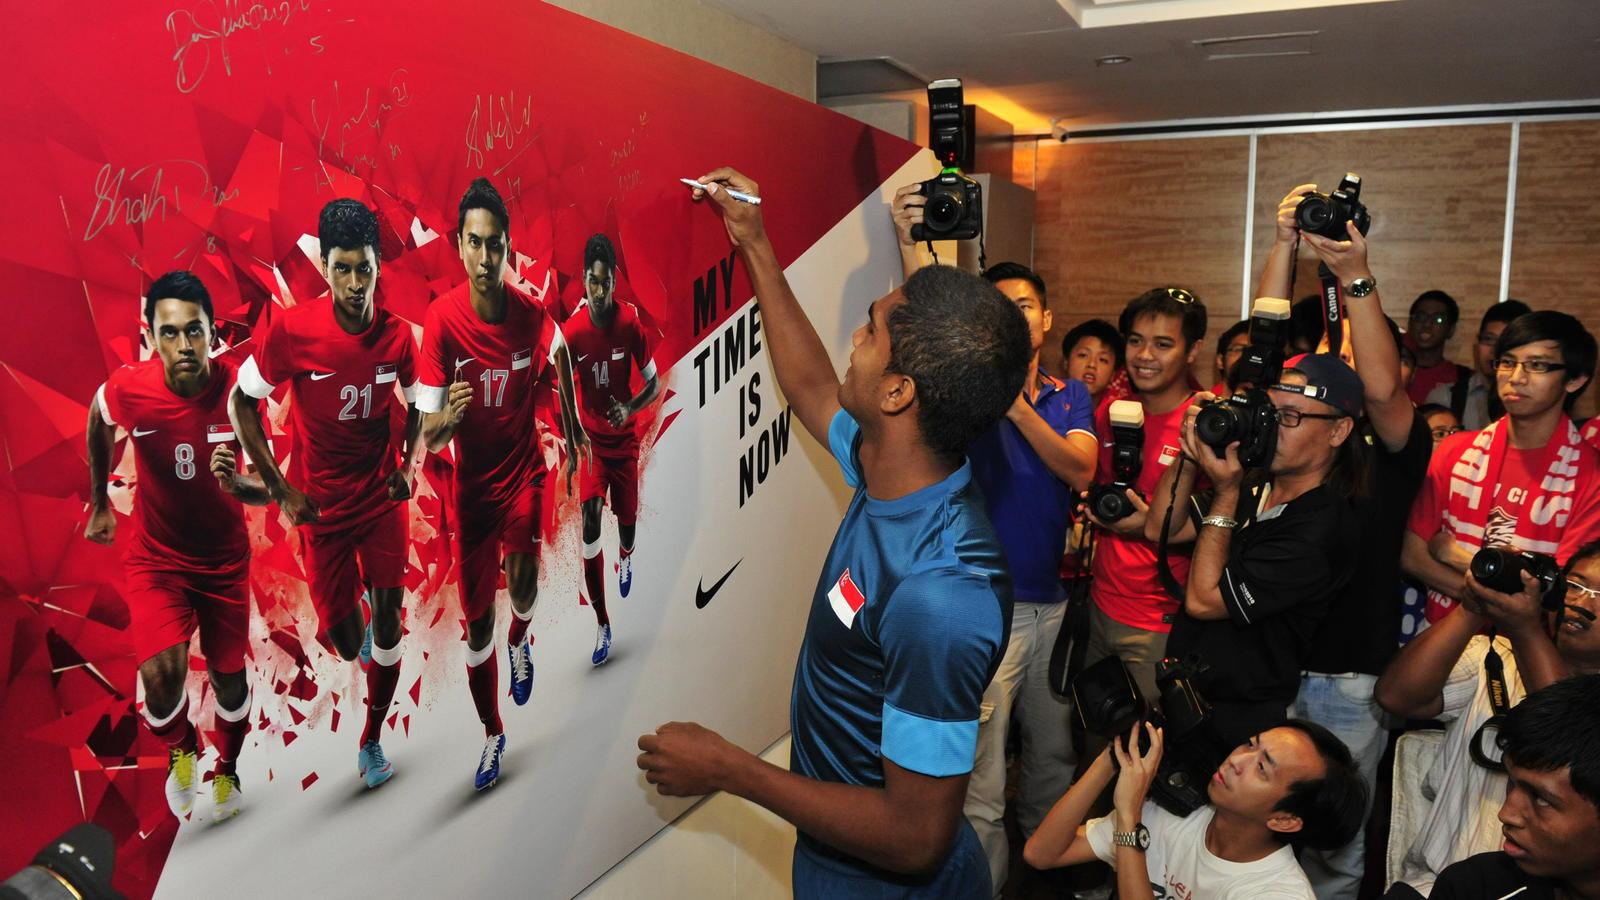 AFF_debutant_Hariss_Harun_signs_message_board